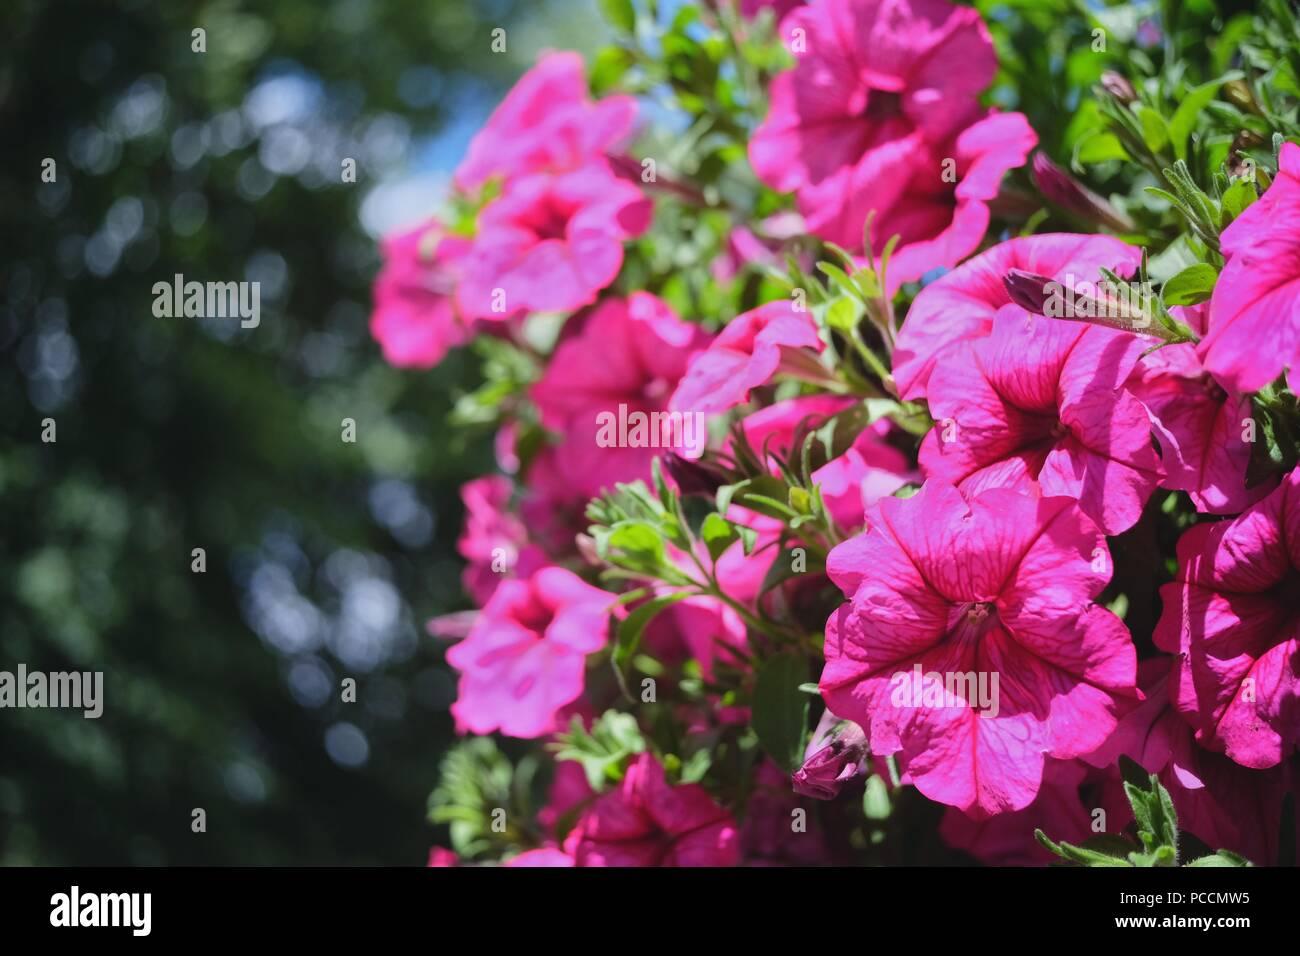 Some Beautiful Flowers Stock Photo 214180097 Alamy